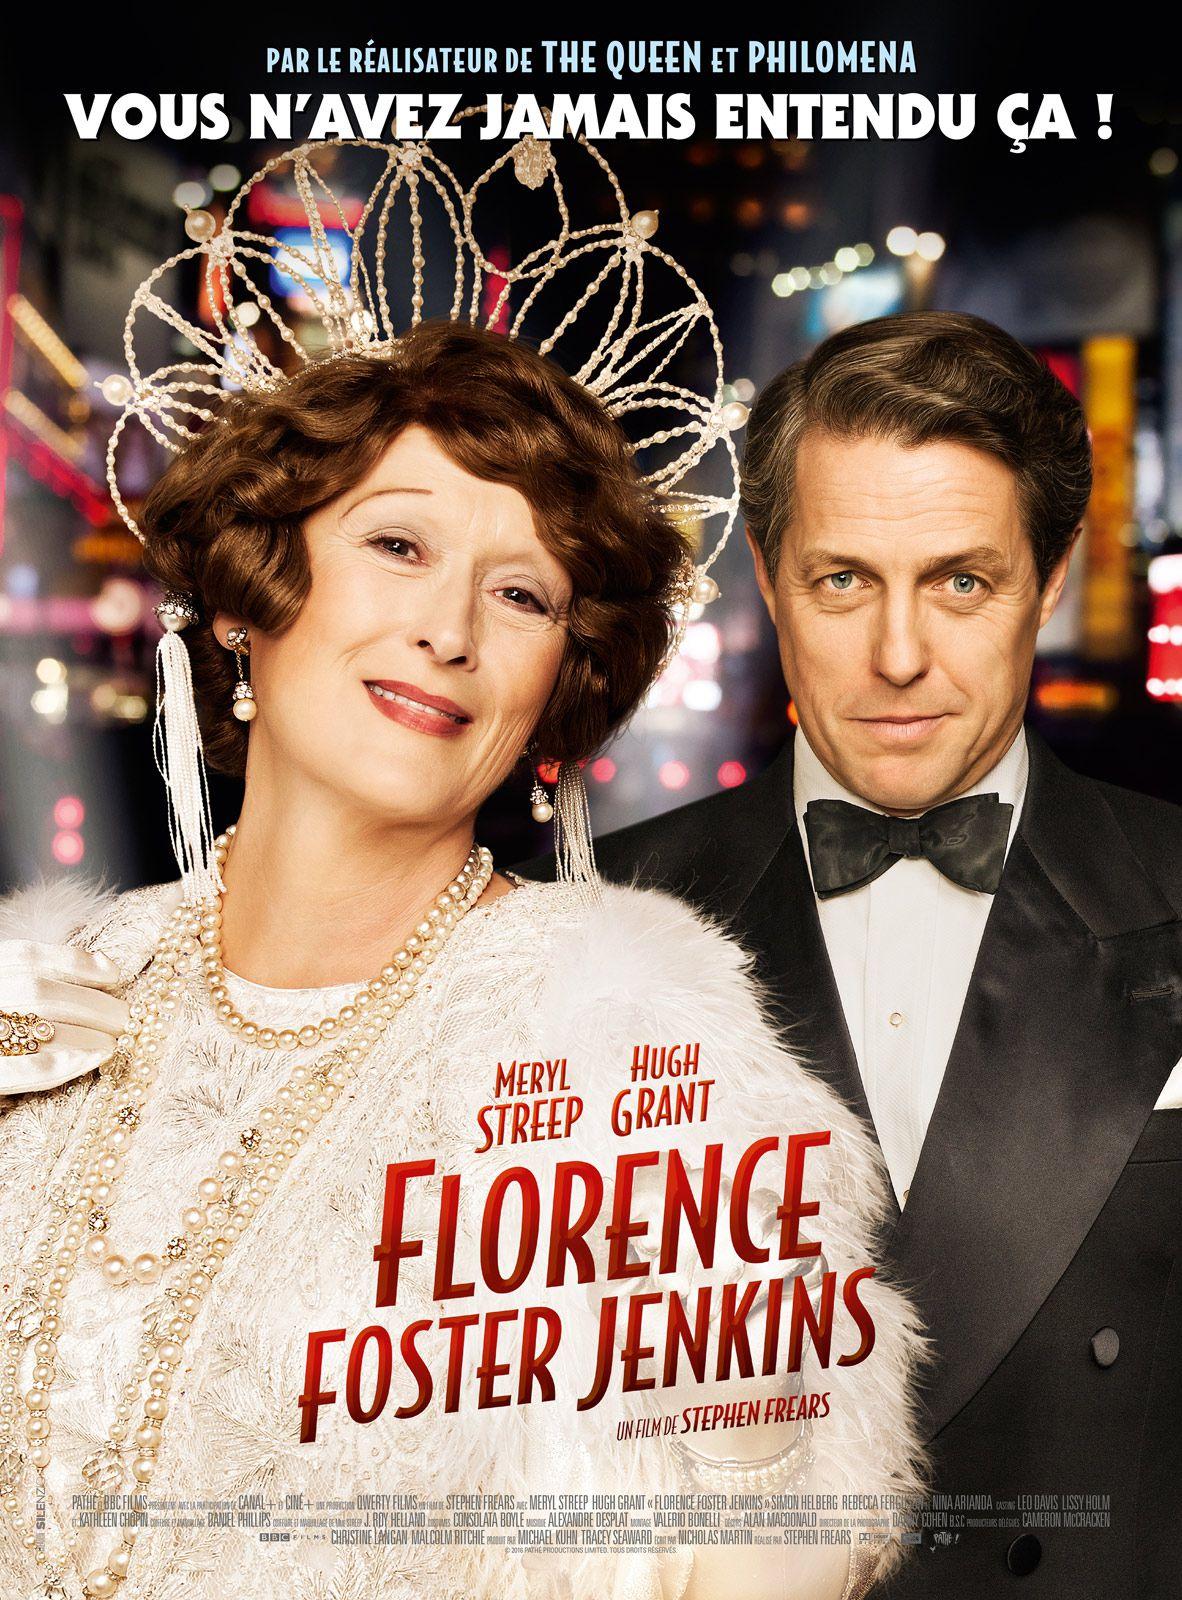 Florence Foster Jenkins - Film (2016)